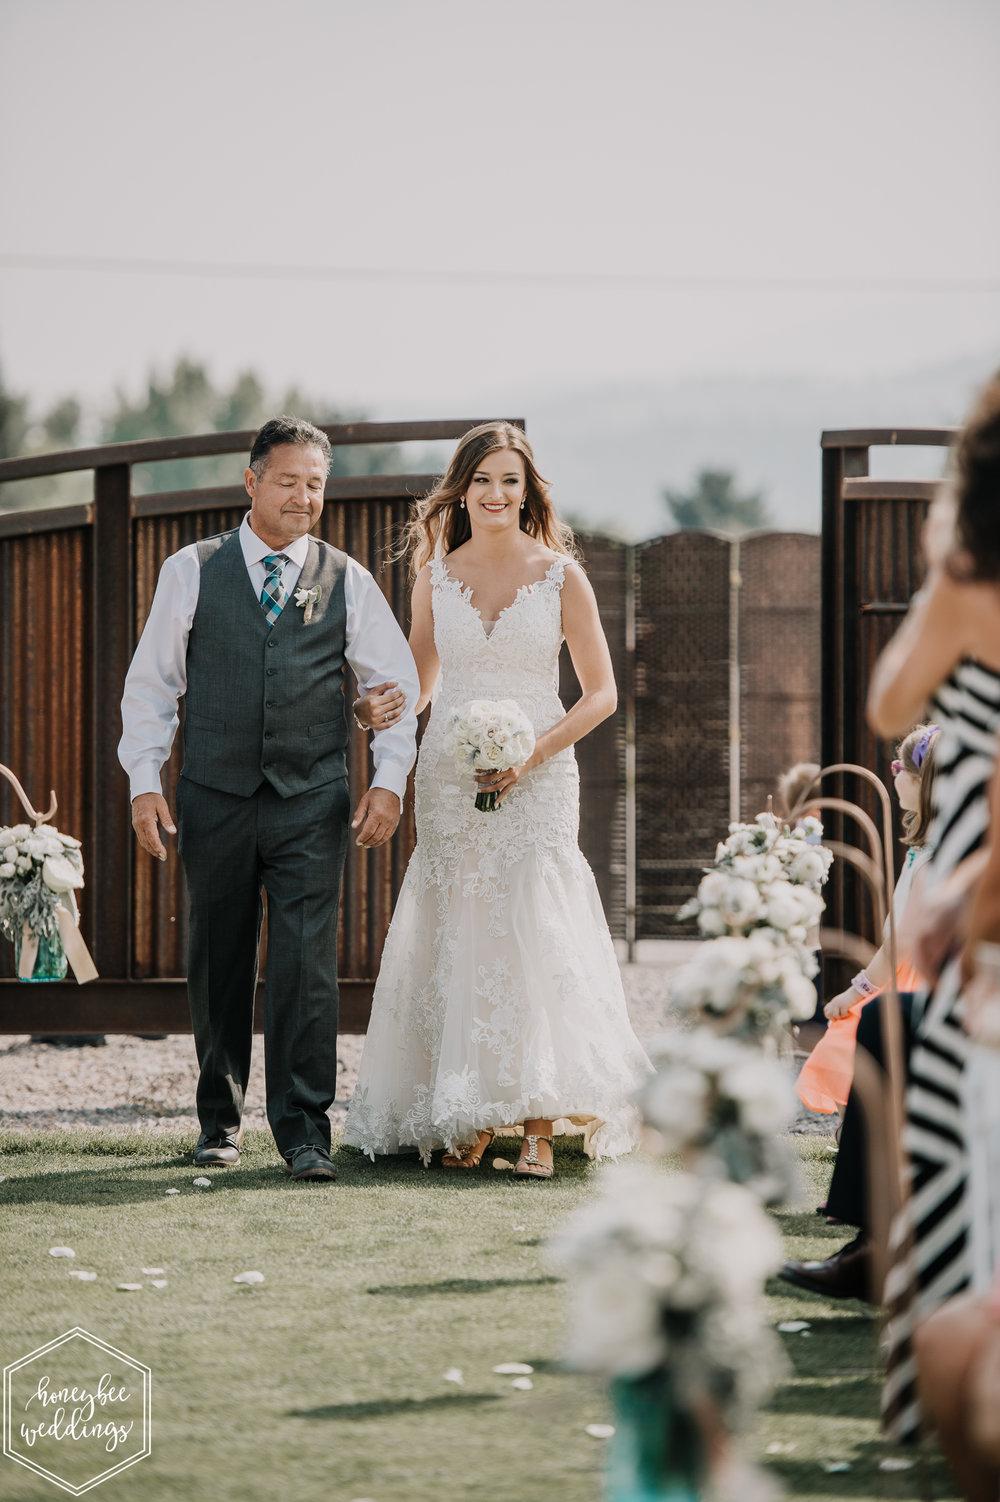 0111The Barn on Mullan Wedding_Montana Wedding Photographer_Danielle Ward + Alex Sherry_December 31, 2011-732.jpg